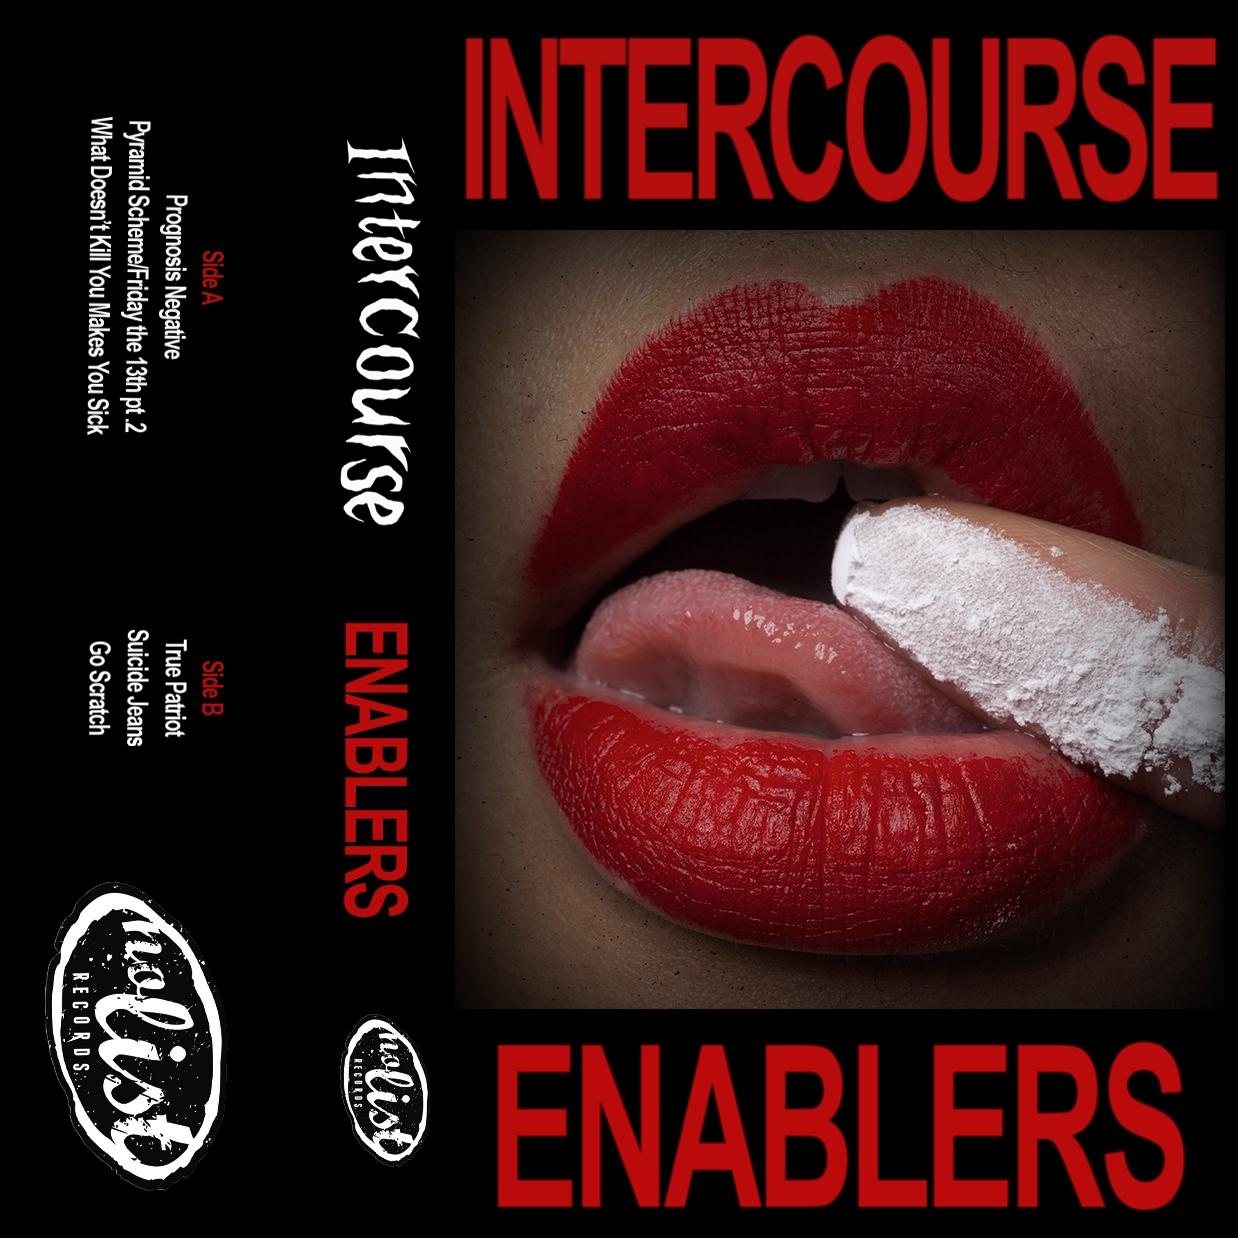 Enablers <br /> intercourse